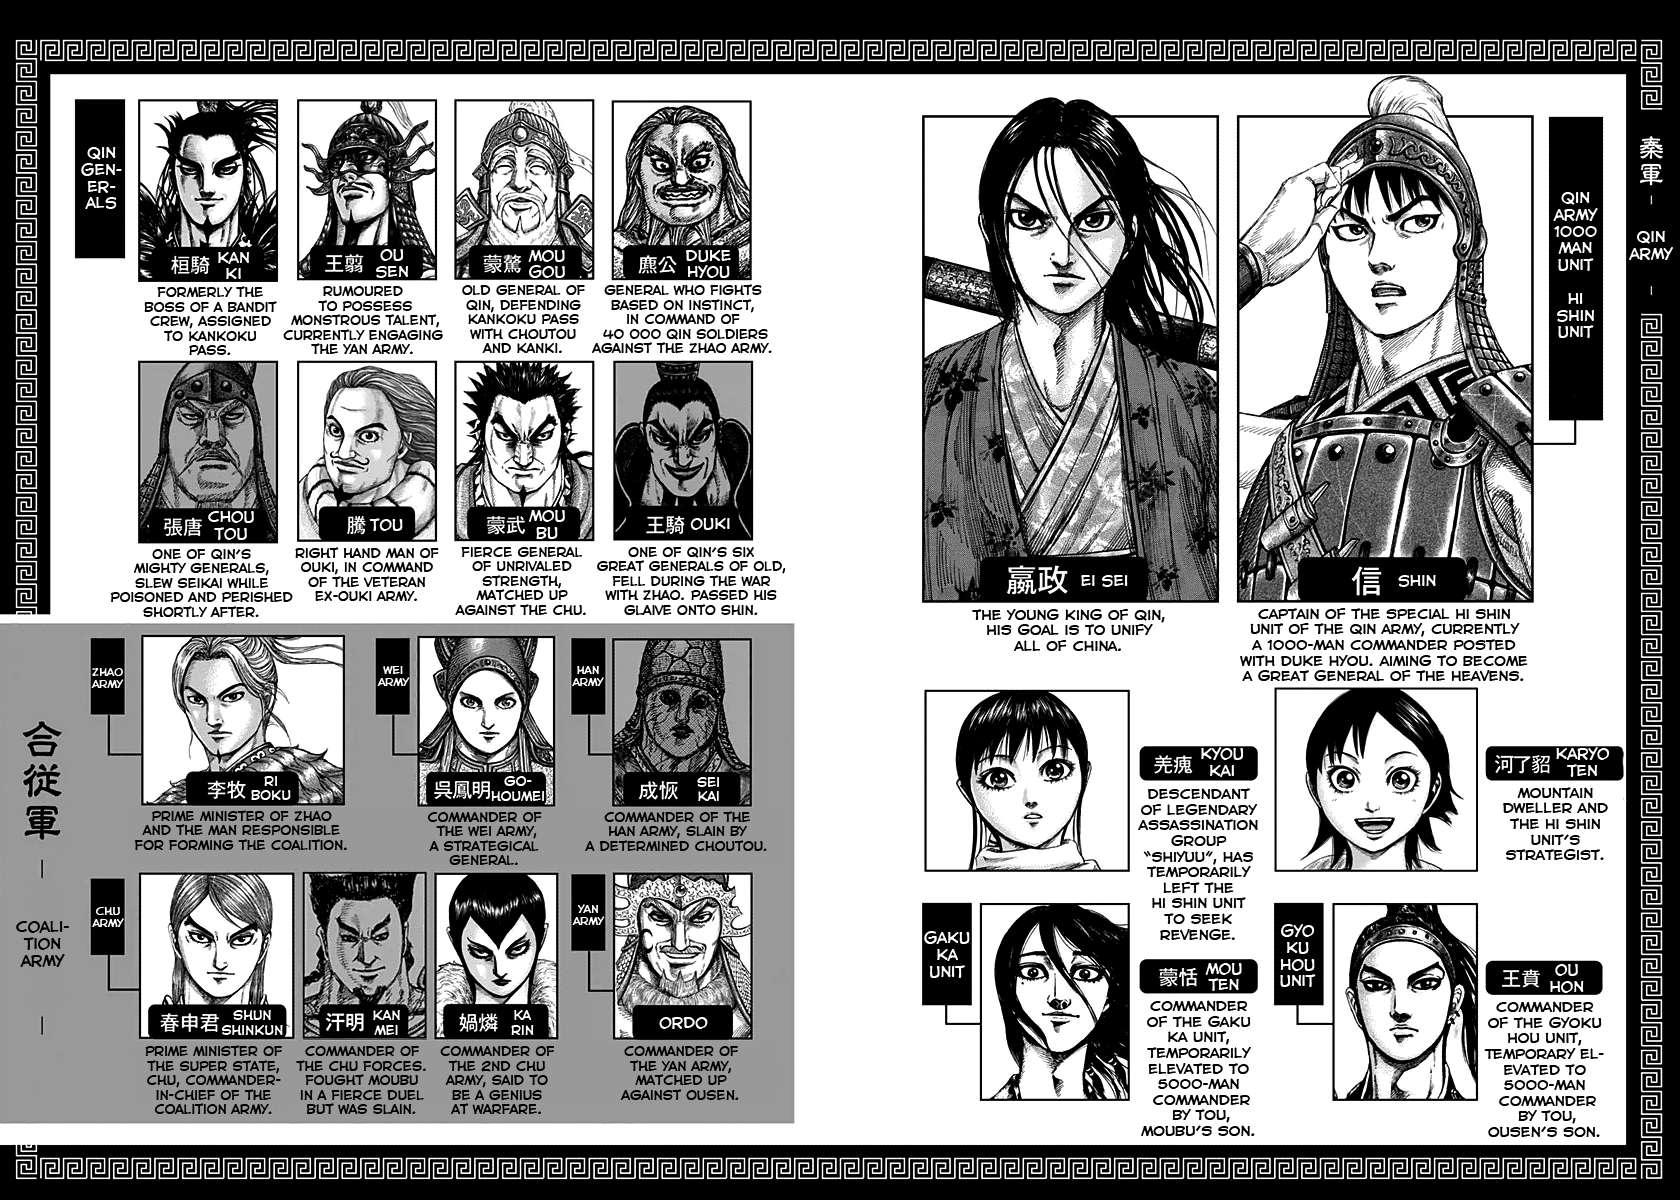 http://c5.ninemanga.com/es_manga/19/12307/360900/cc121130dd47a88c47a21f069f8145b7.jpg Page 5